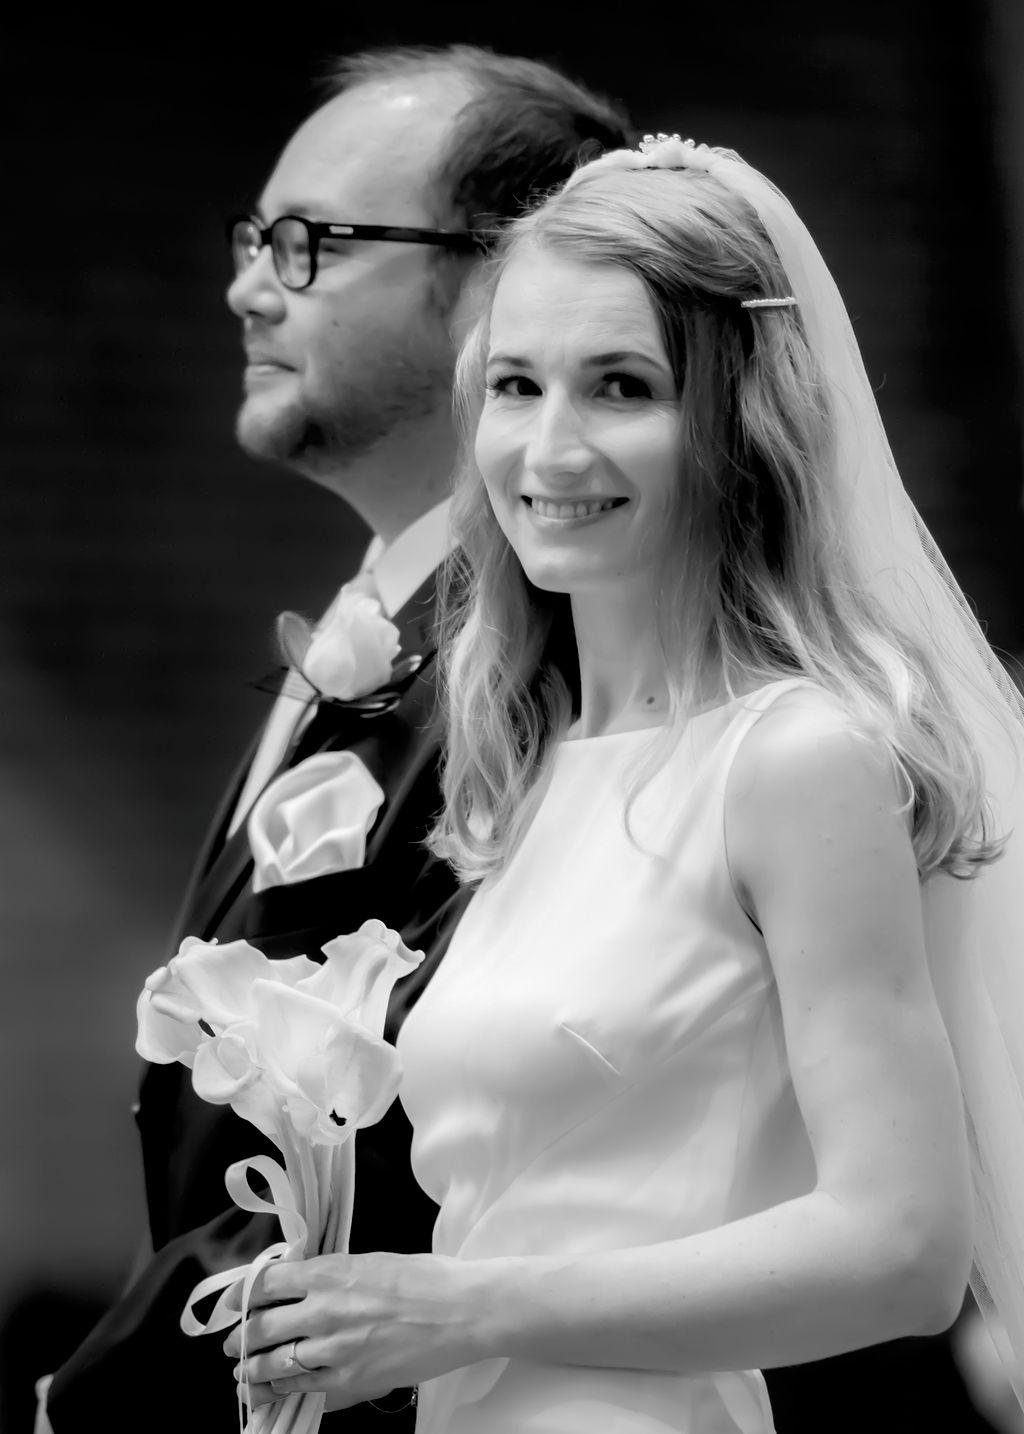 Wedding and Event Photography - Fairfax 2020